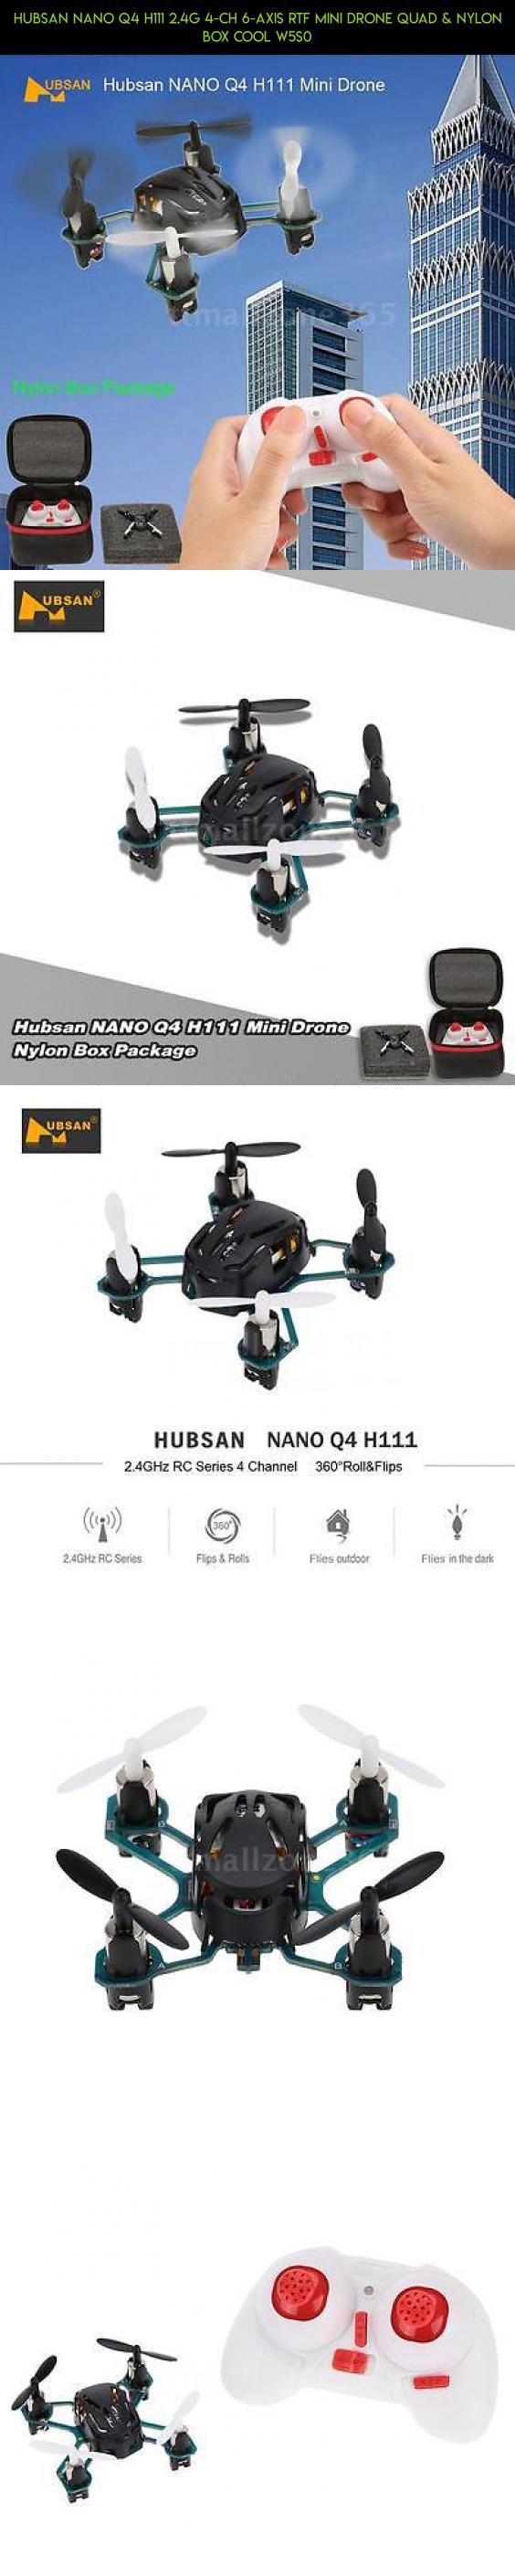 Hubsan NANO Q4 H111 2.4G 4-CH 6-Axis RTF Mini Drone Quad & Nylon Box Cool W5S0 #drone #technology #parts #plans #products #camera #racing #drone #tech #fpv #kit #gadgets #shopping #mini #hubsan